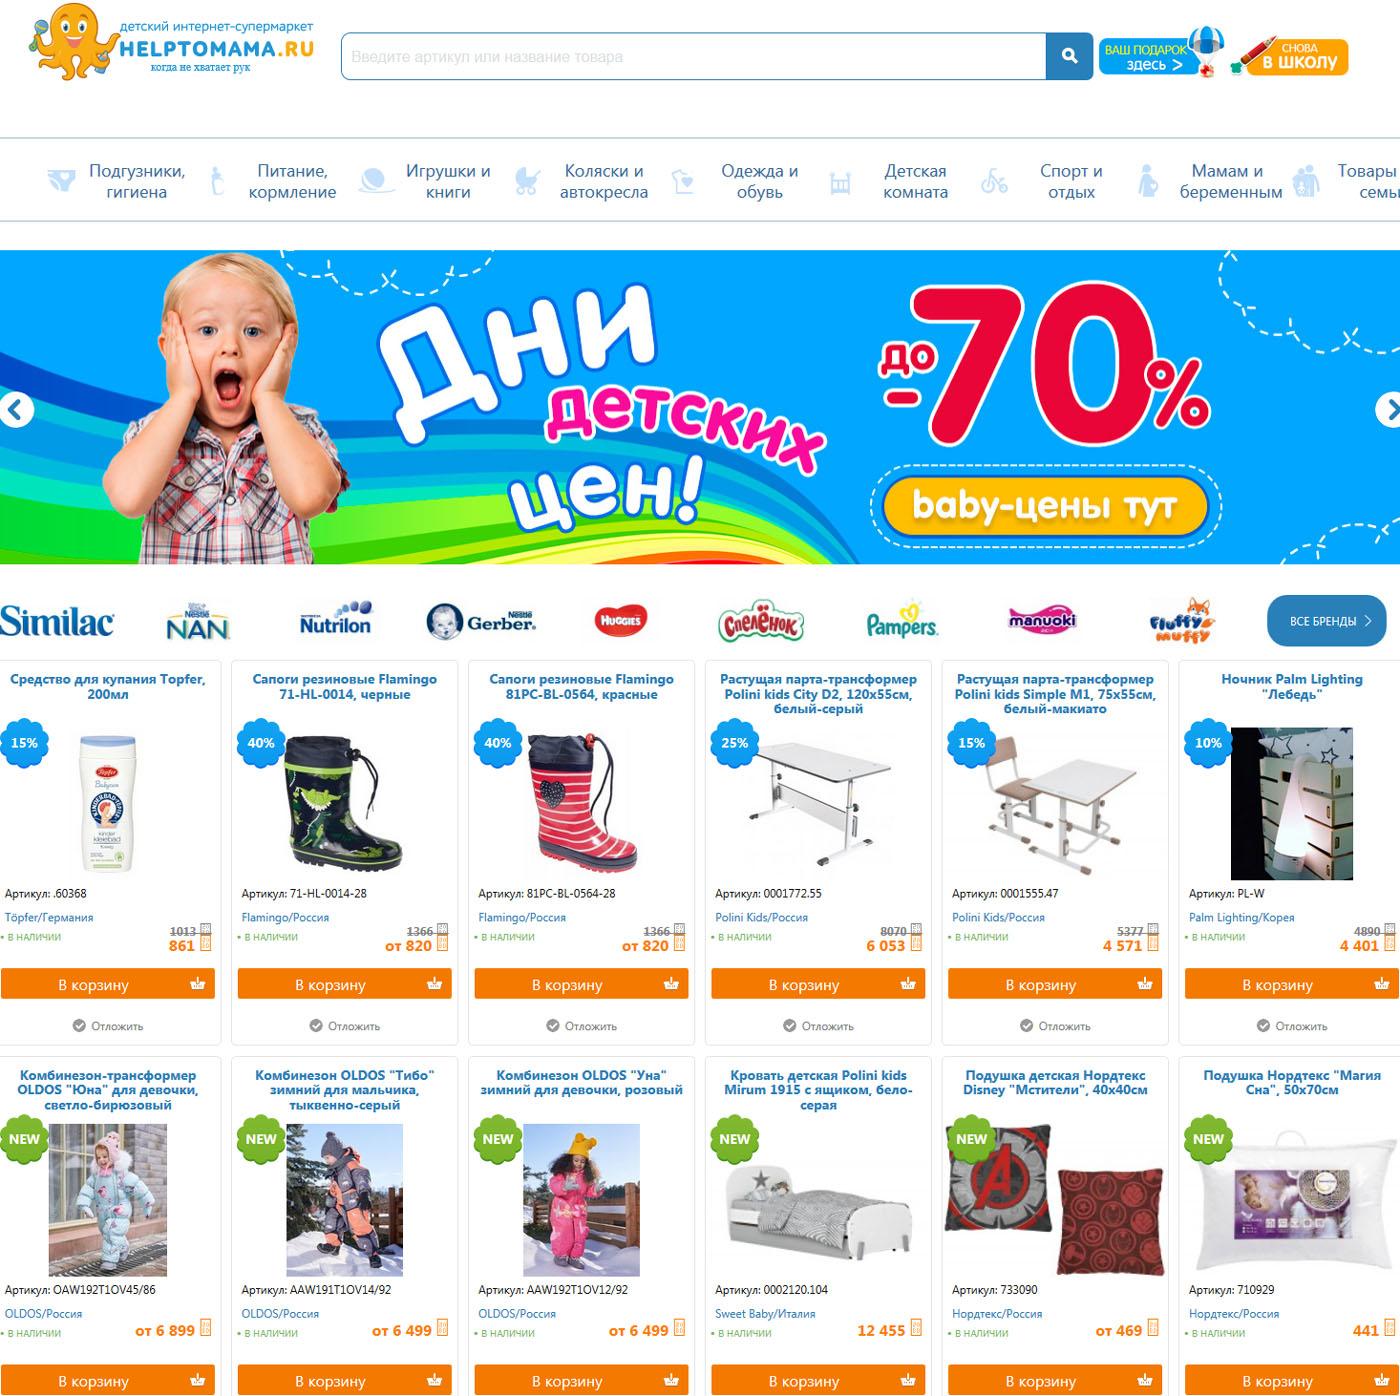 Интернет-магазин Хелптумама